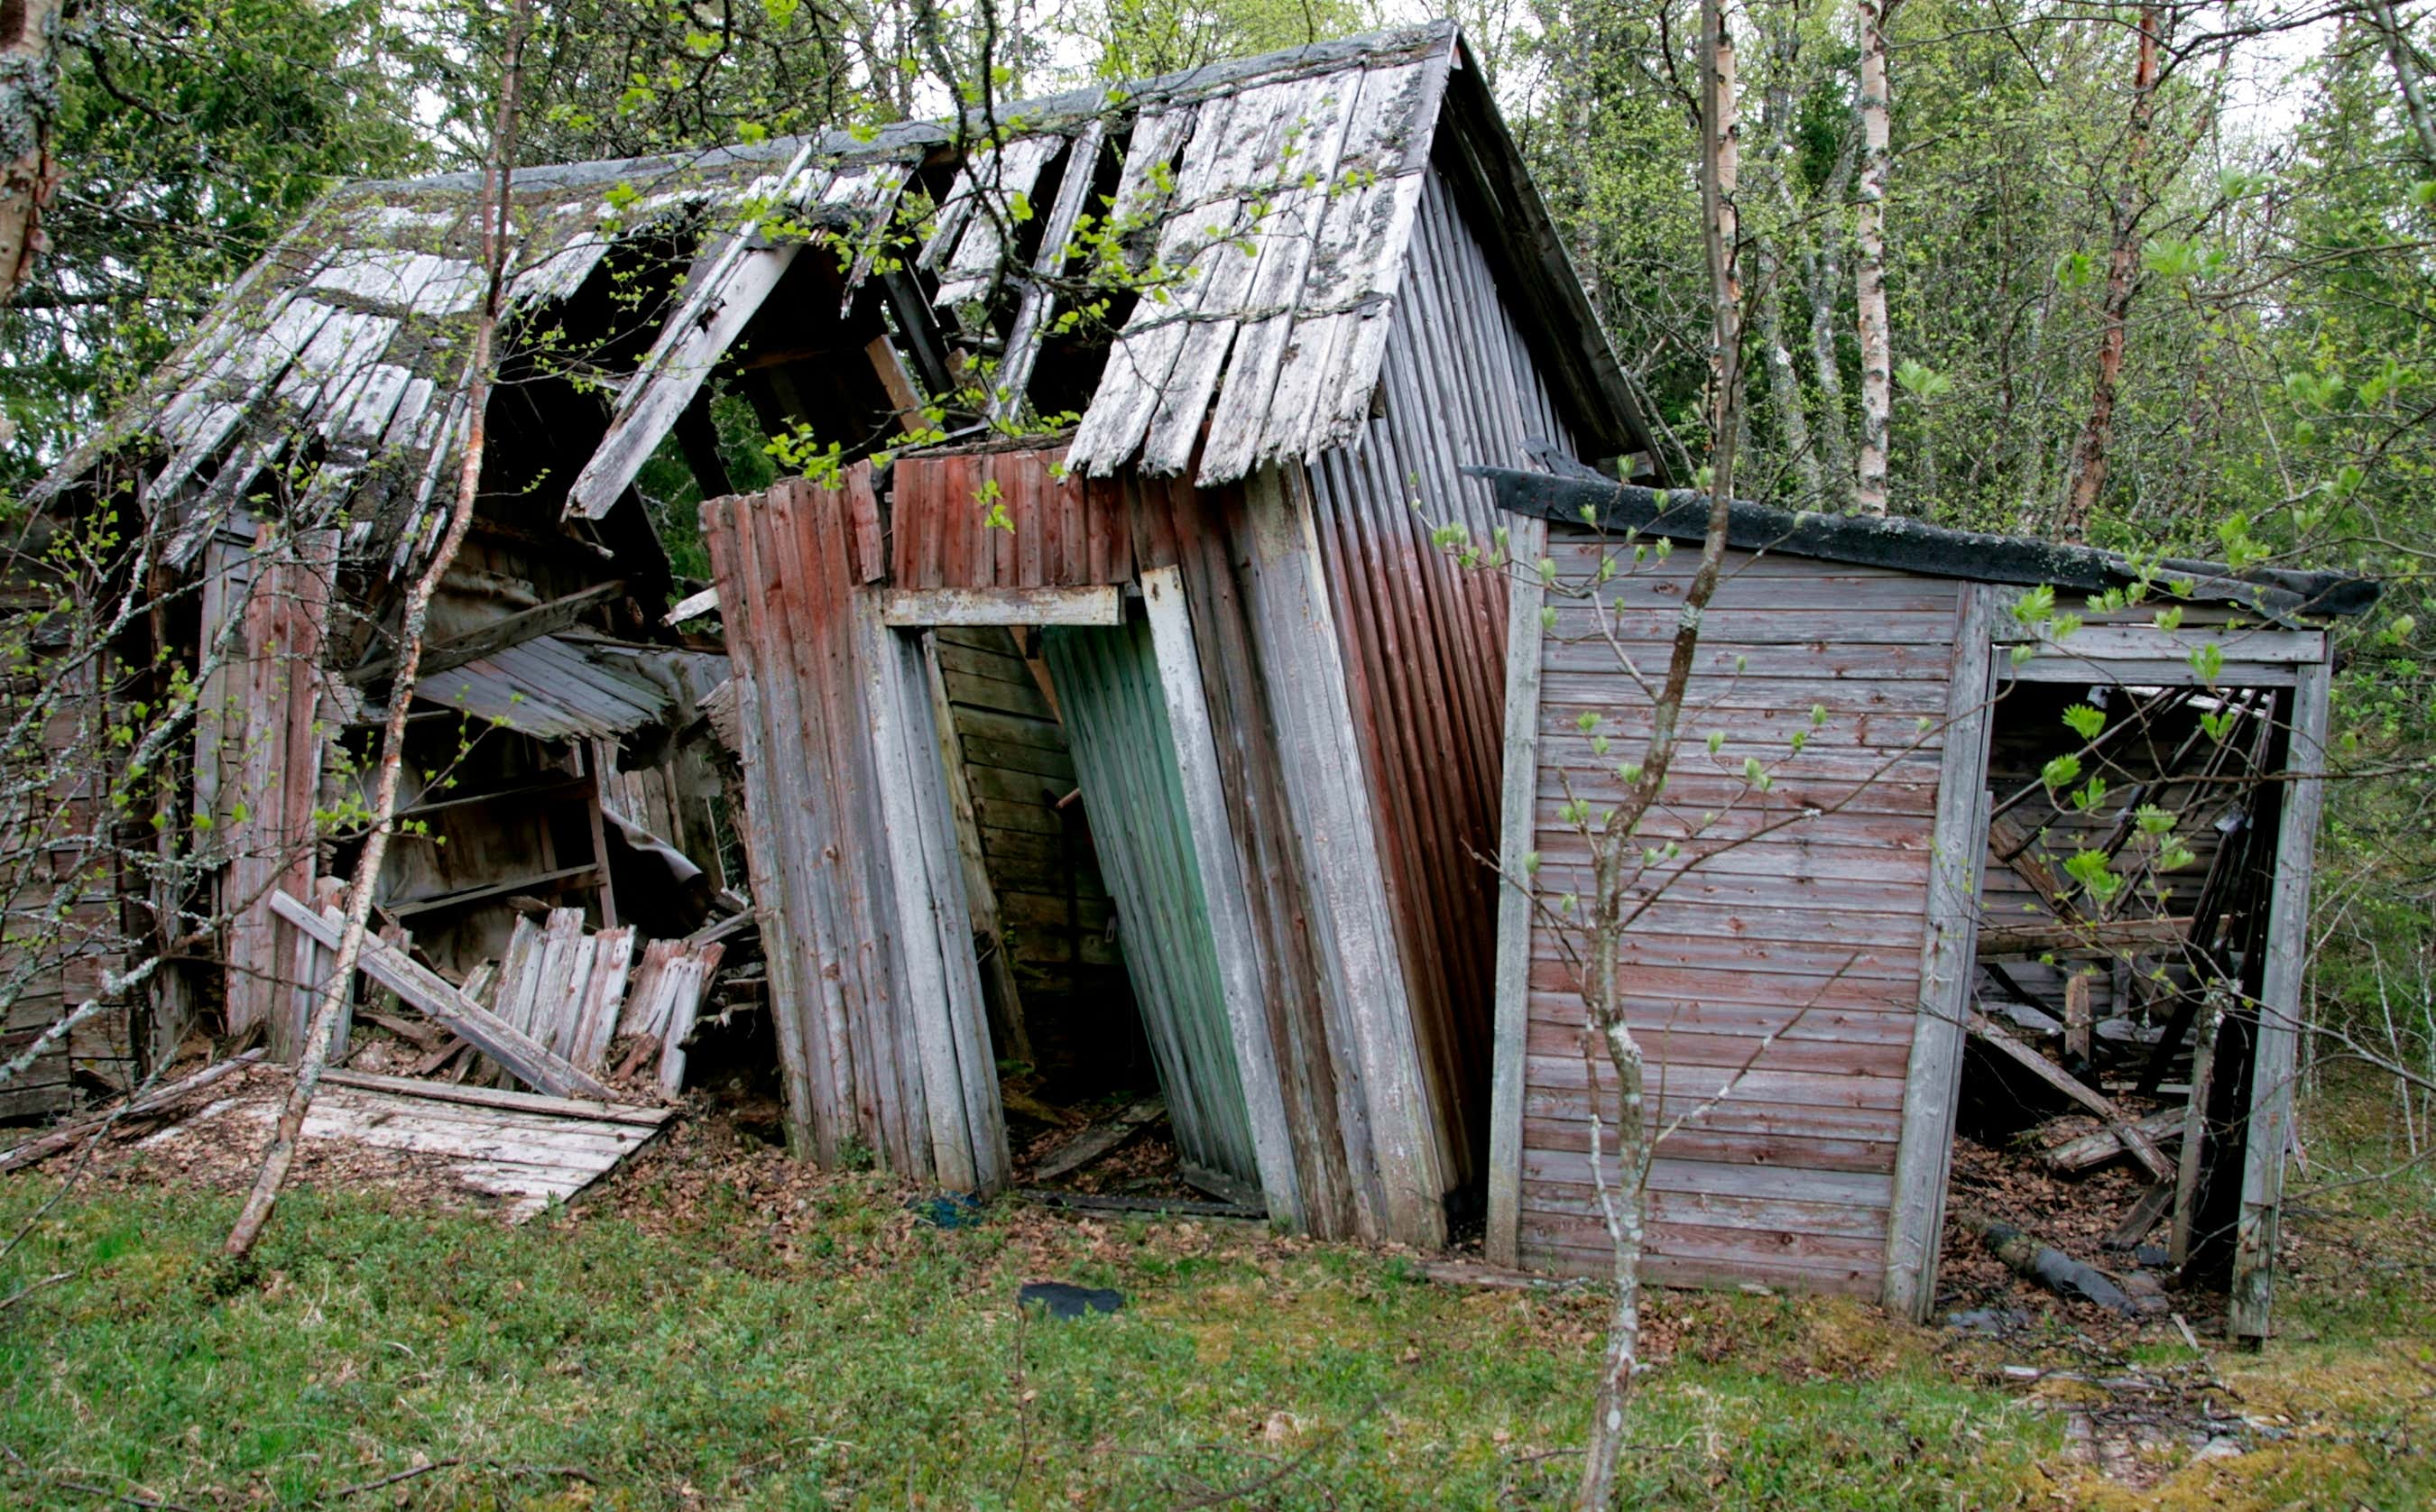 Berühmt Gartenhaus abbauen: So gelingen Abriss & Entsorgung IB32